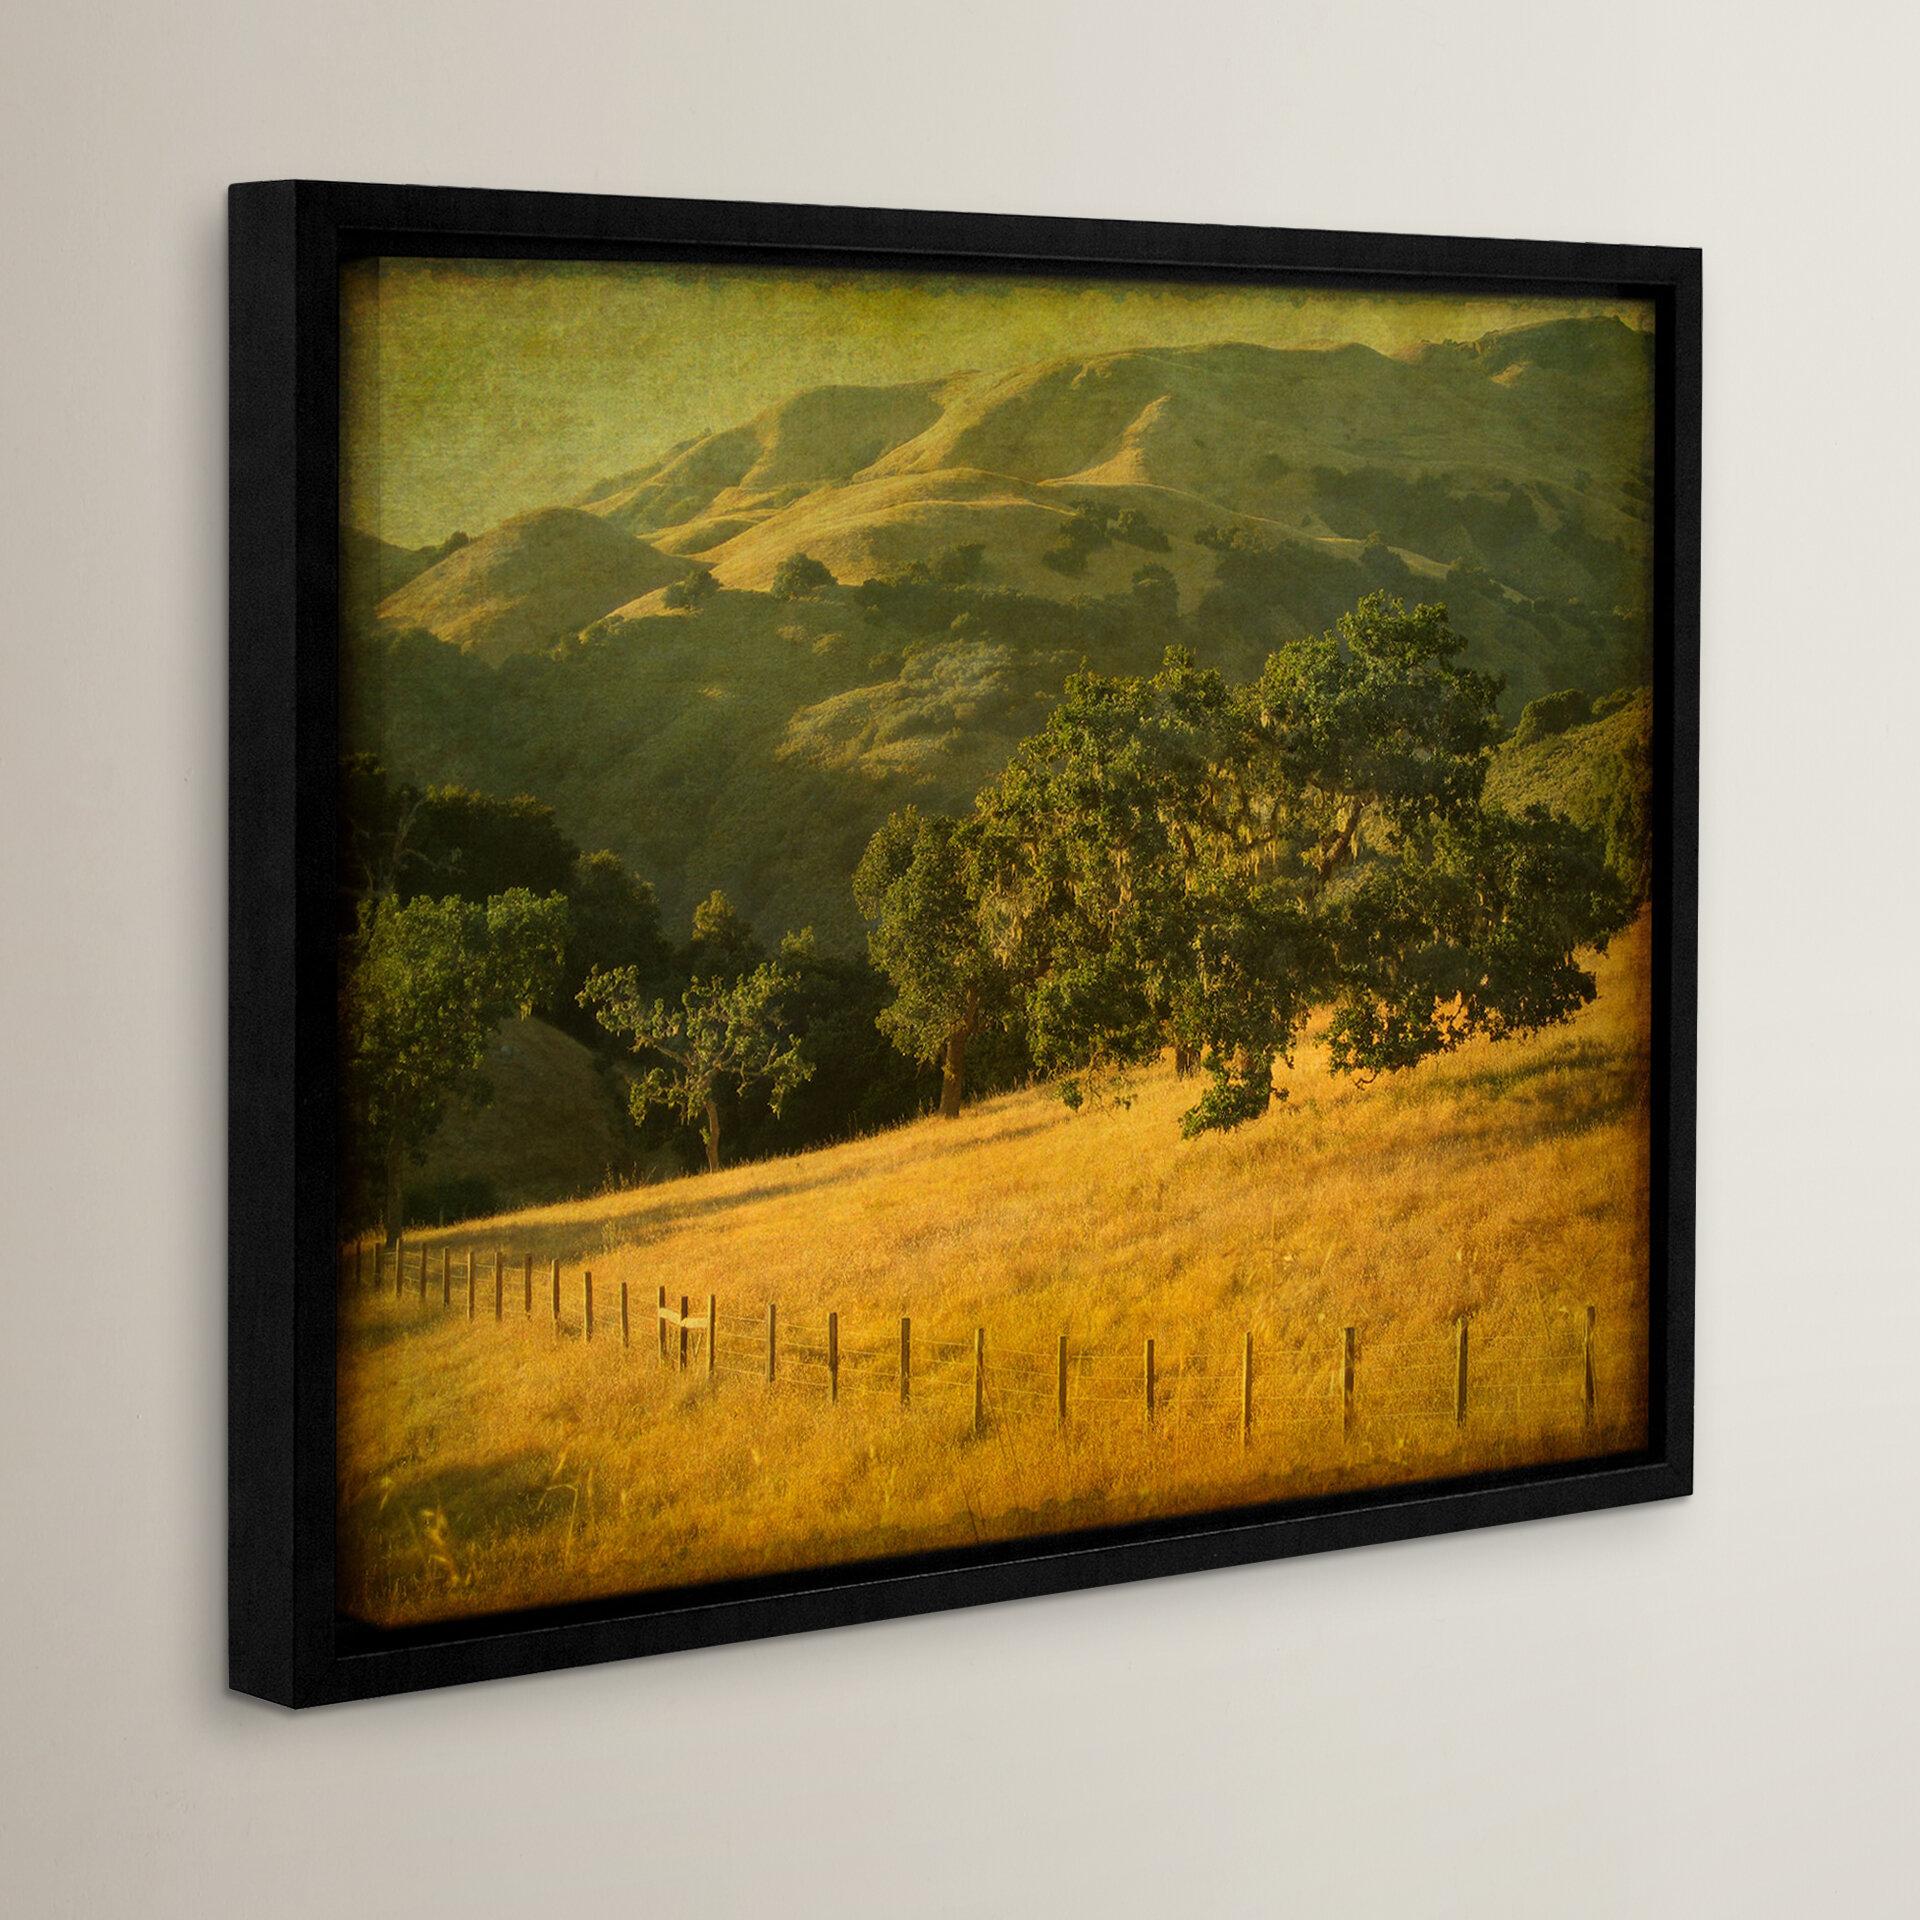 Loon Peak Oak And Fence Framed Photographic Print Wayfair